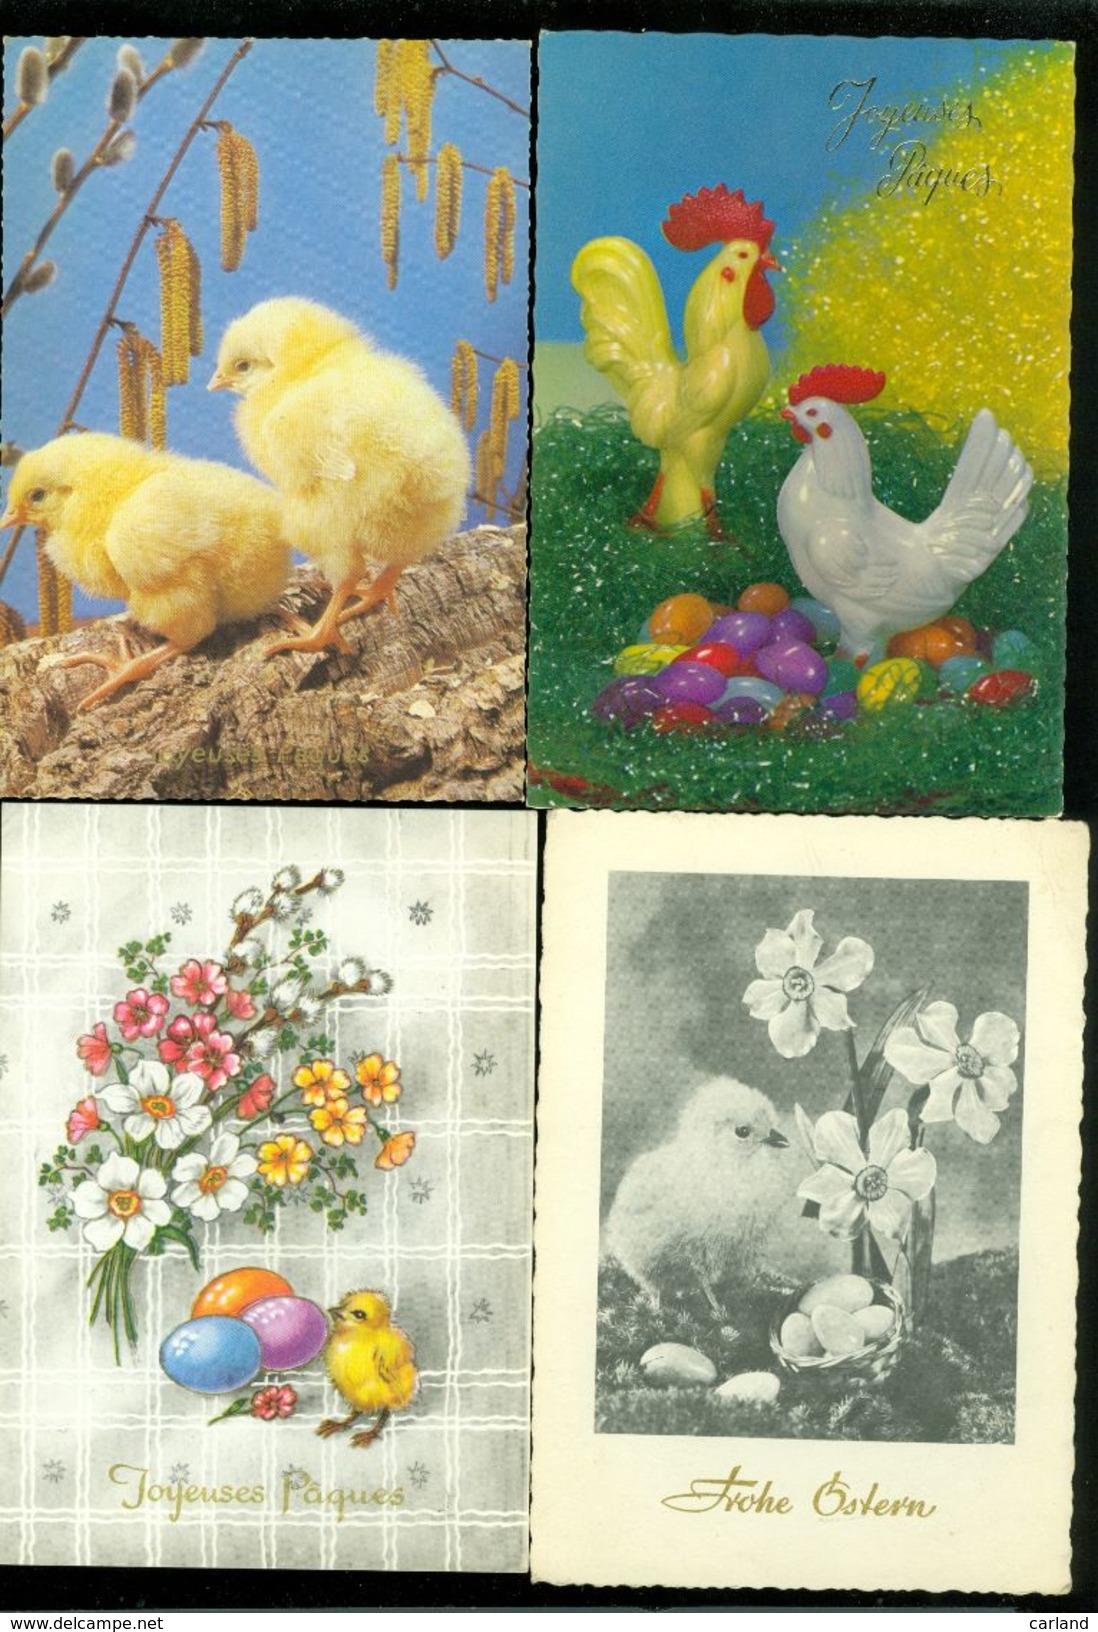 Beau Lot De 60 Cartes Postales S.- M. Grand Format De Fantaisie  Pâques     Mooi Lot Van 60 Postkaarten Fantasie  Pasen - Cartes Postales